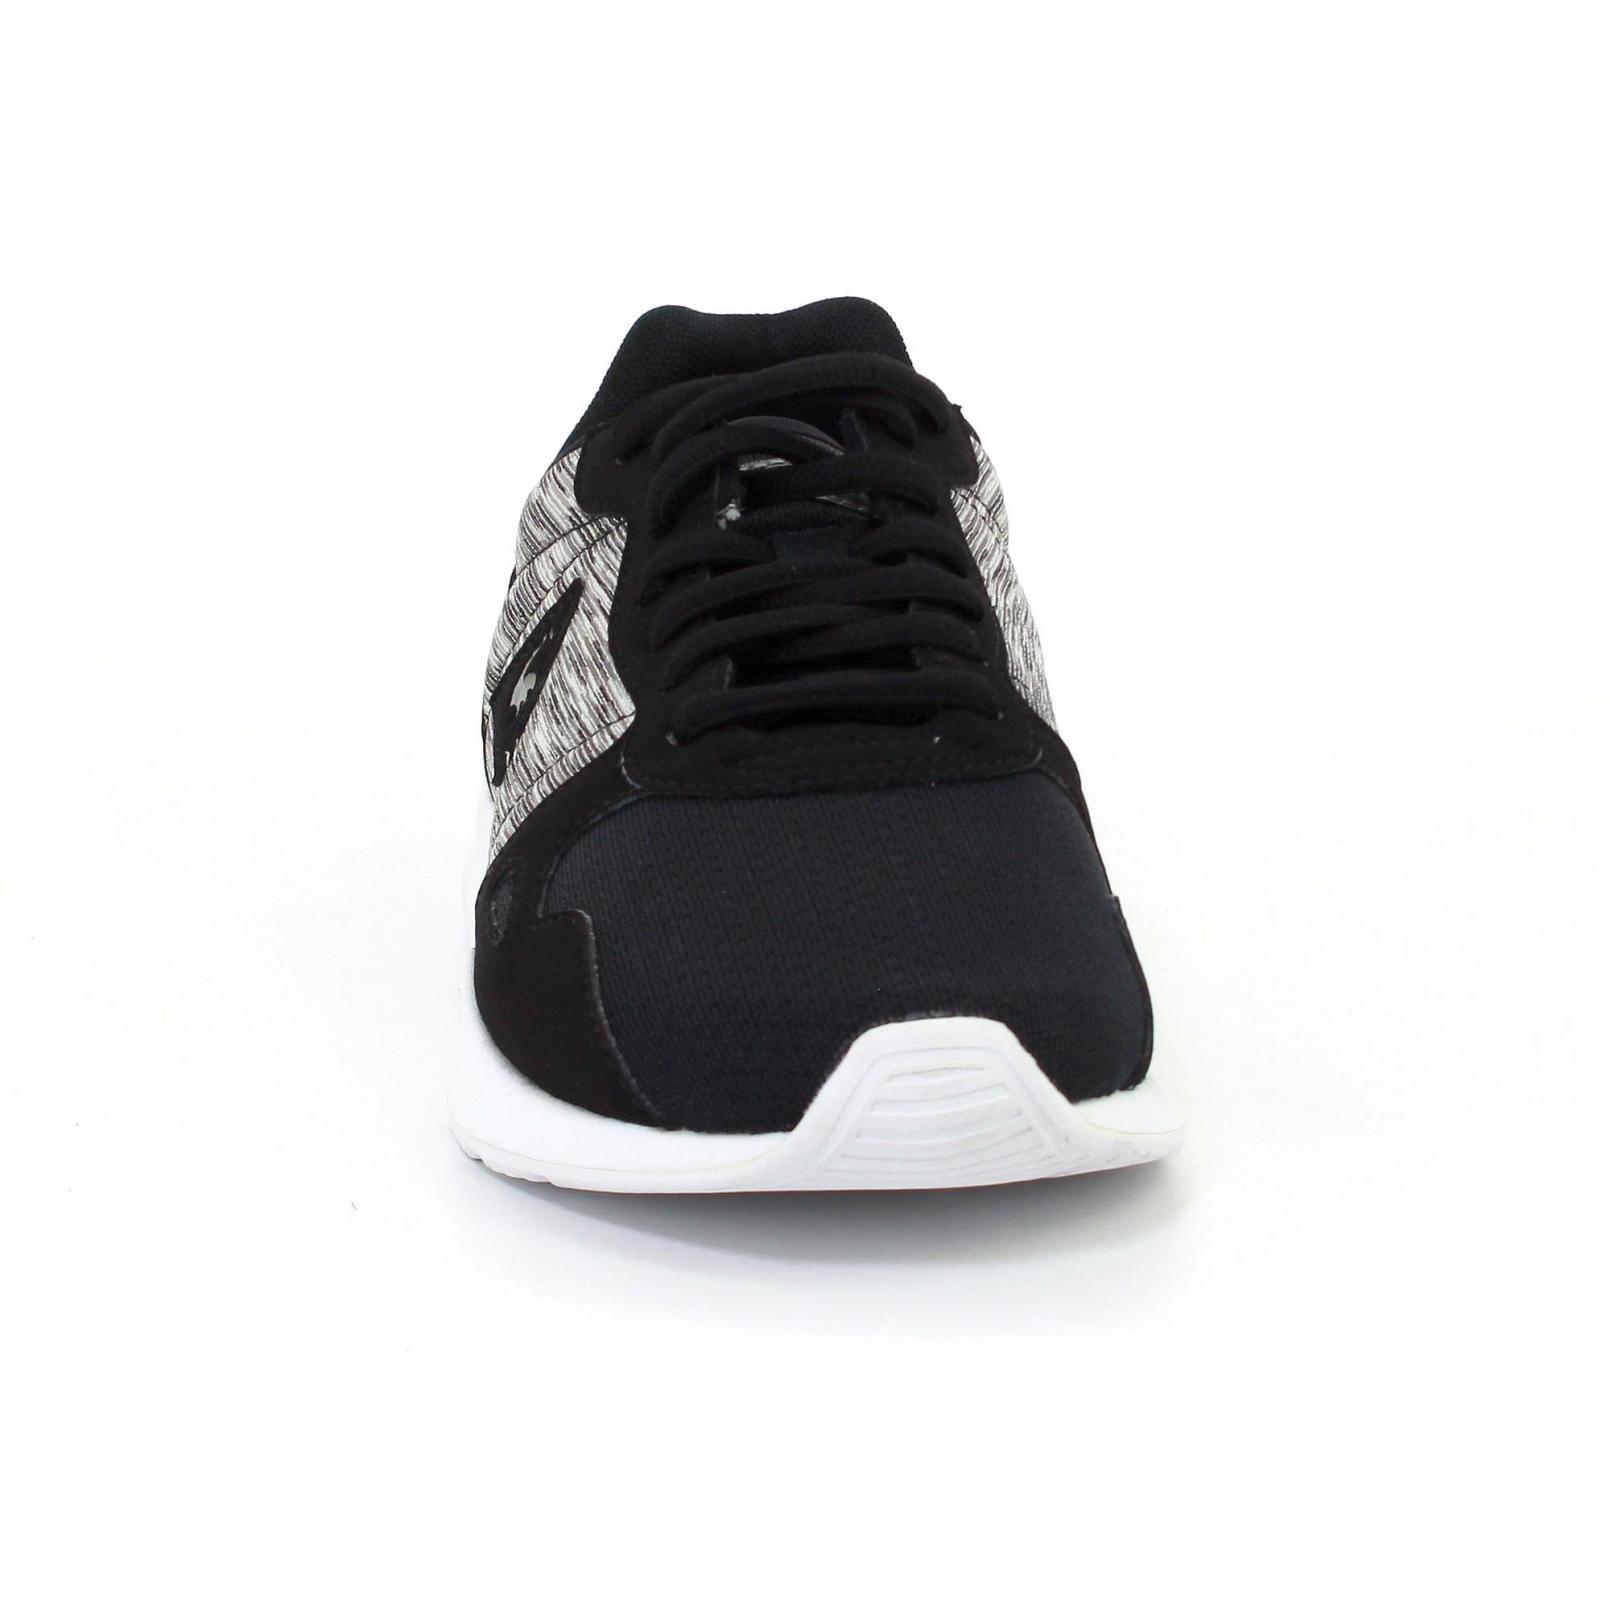 Shoes – Le Coq Sportif Lcs R600 W Jacquard Glitter Black